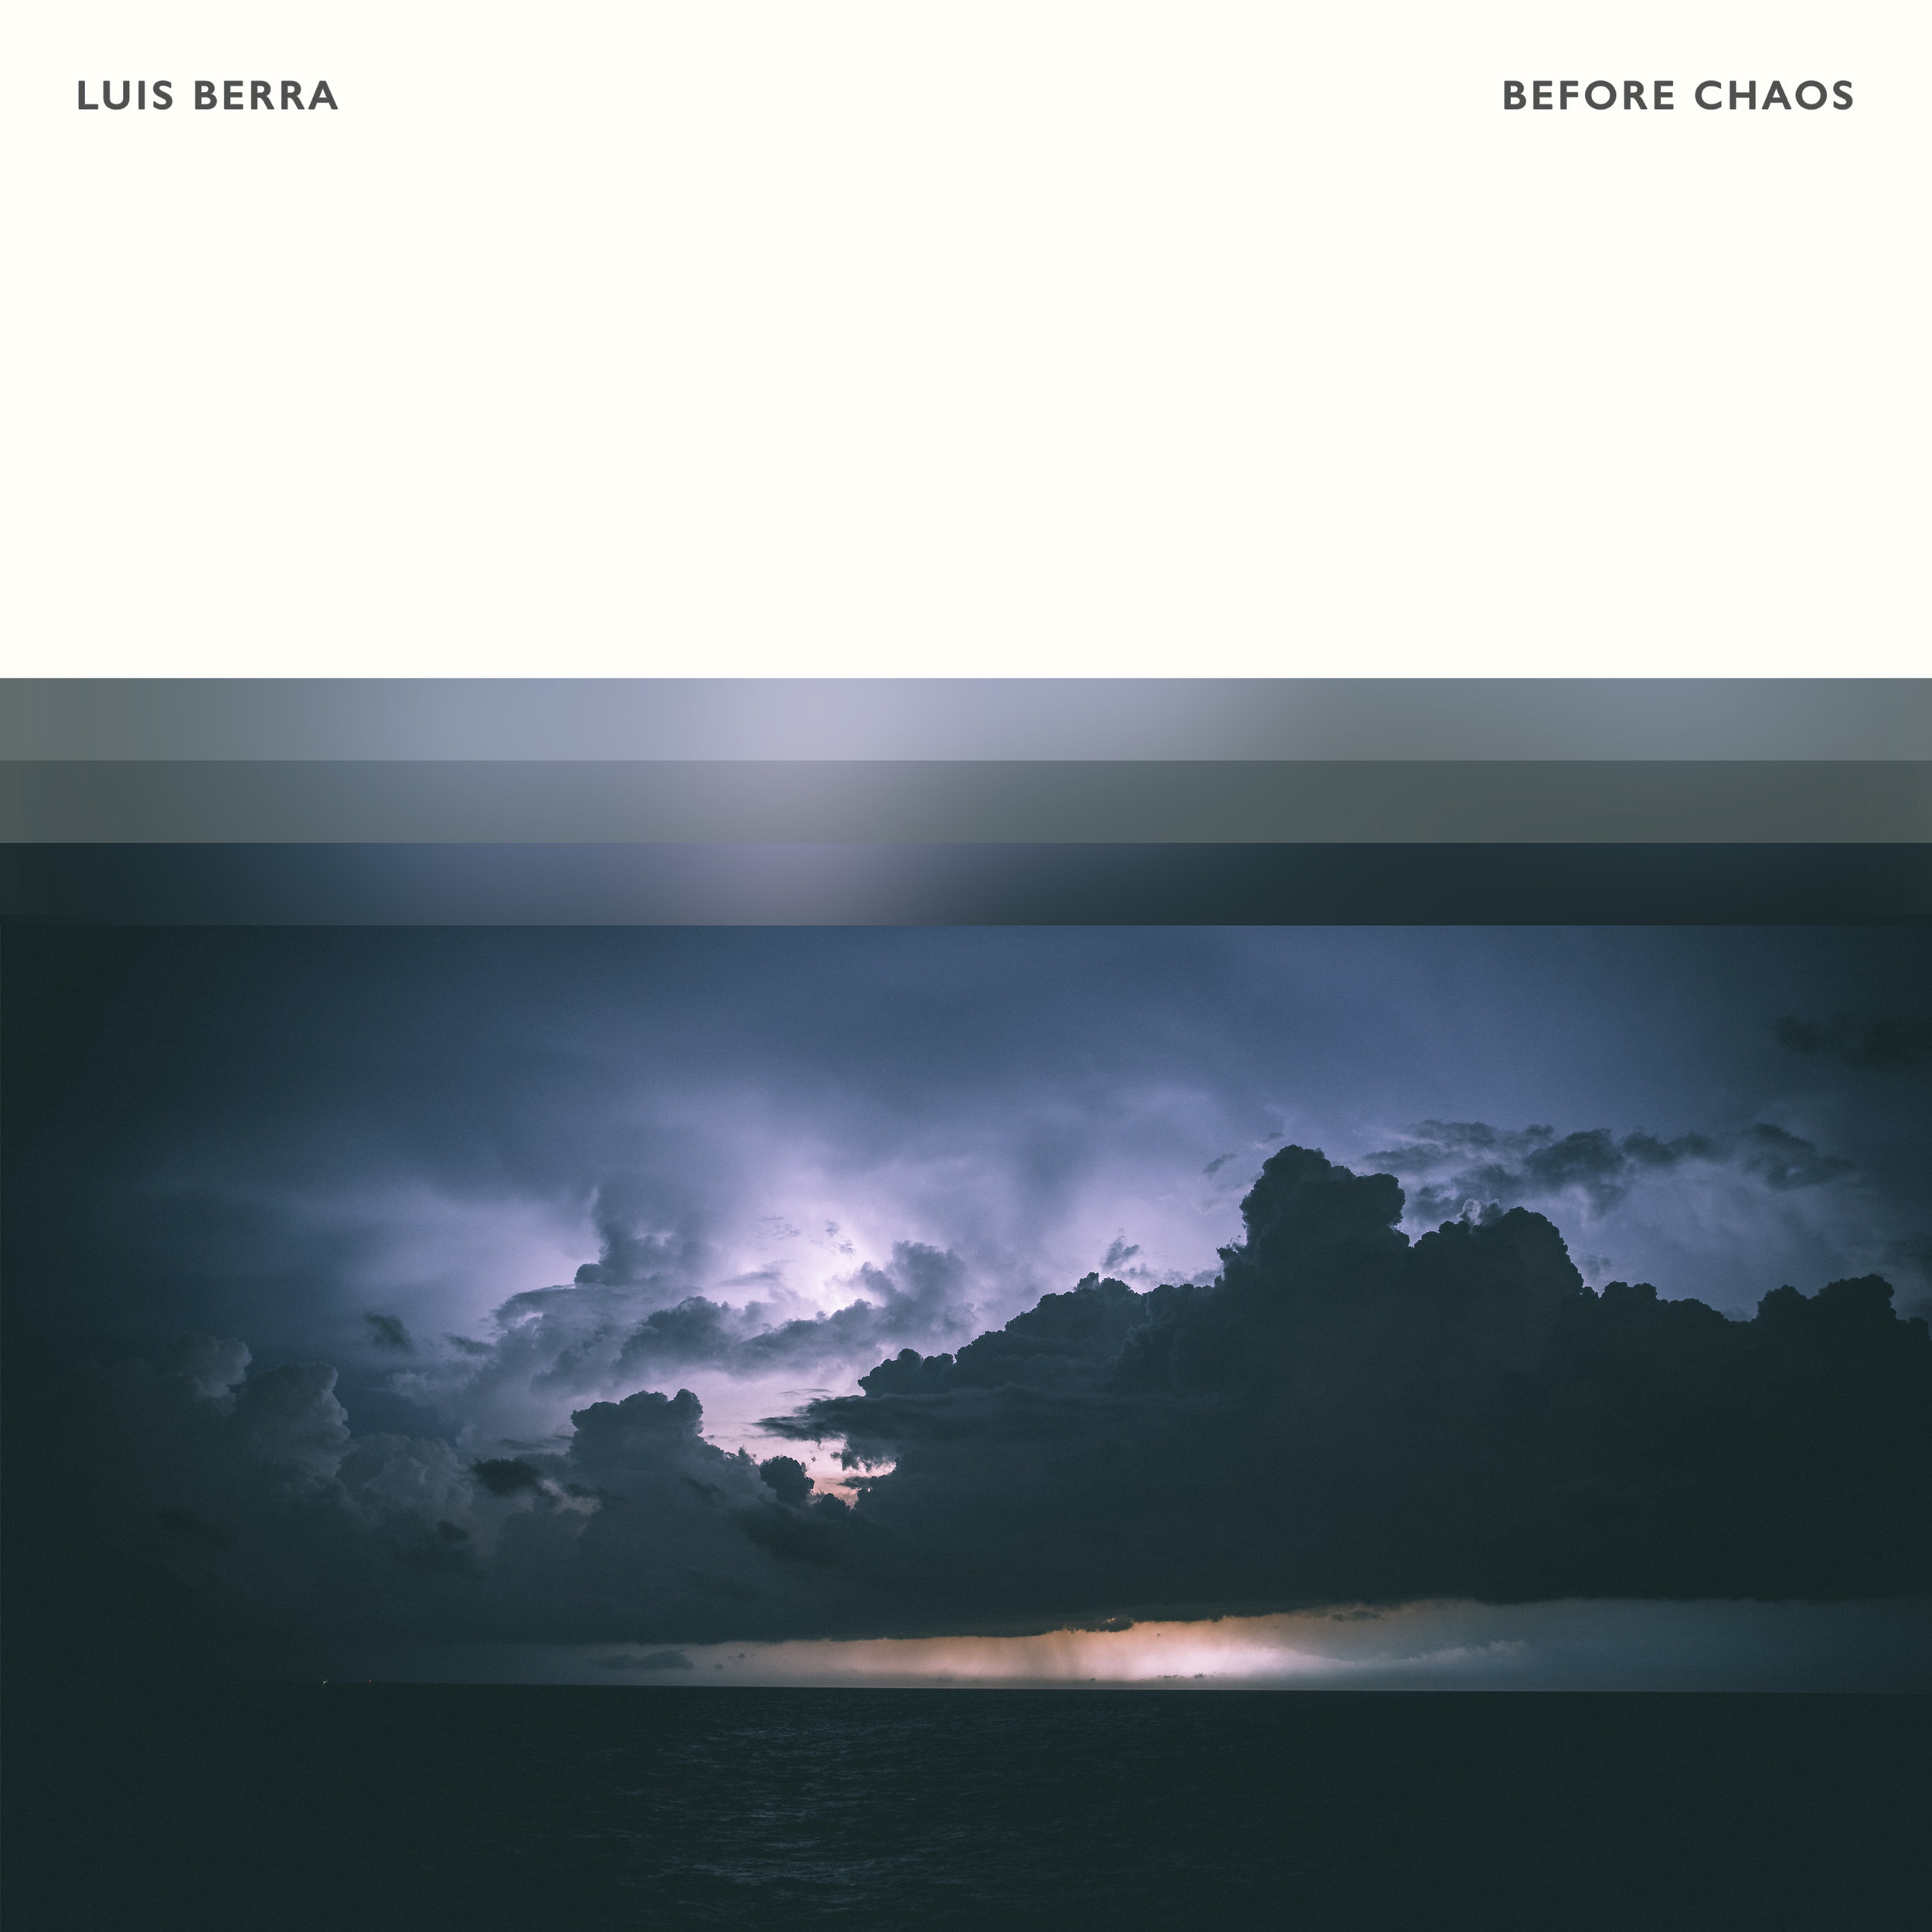 Luis Berra - Before Chaos